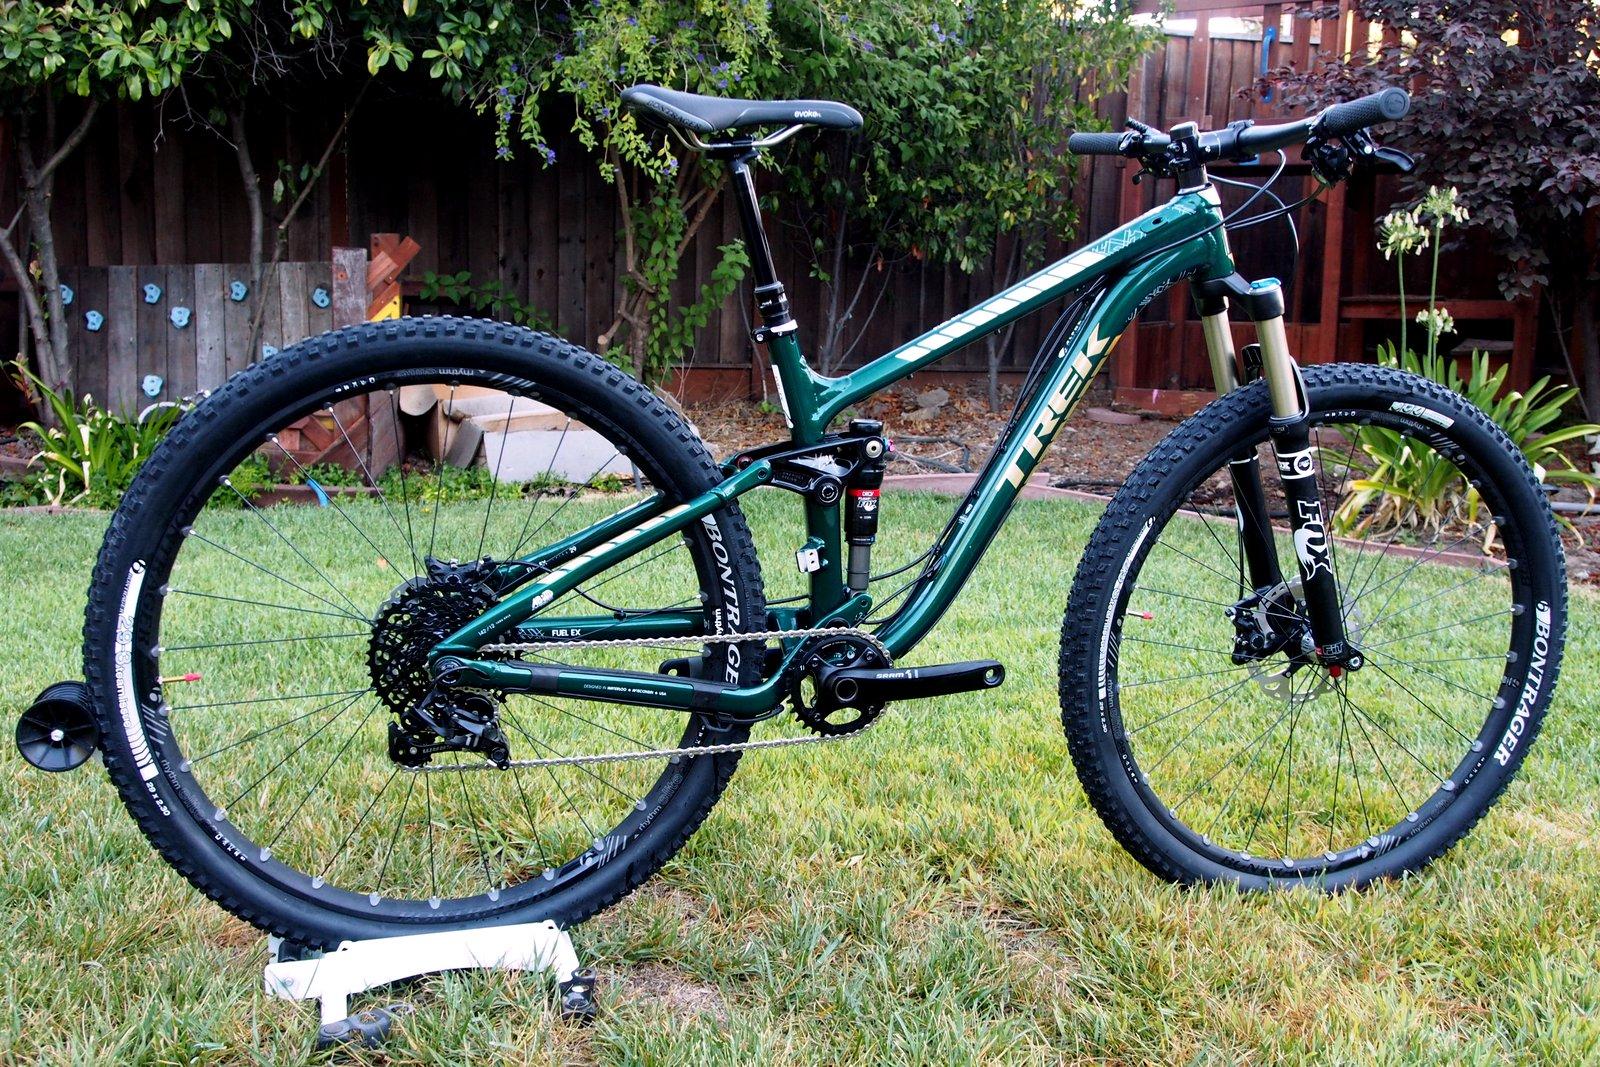 1babc136d11 Tested: Trek Fuel EX 29 - Project One Bike Arrives- Mtbr.com